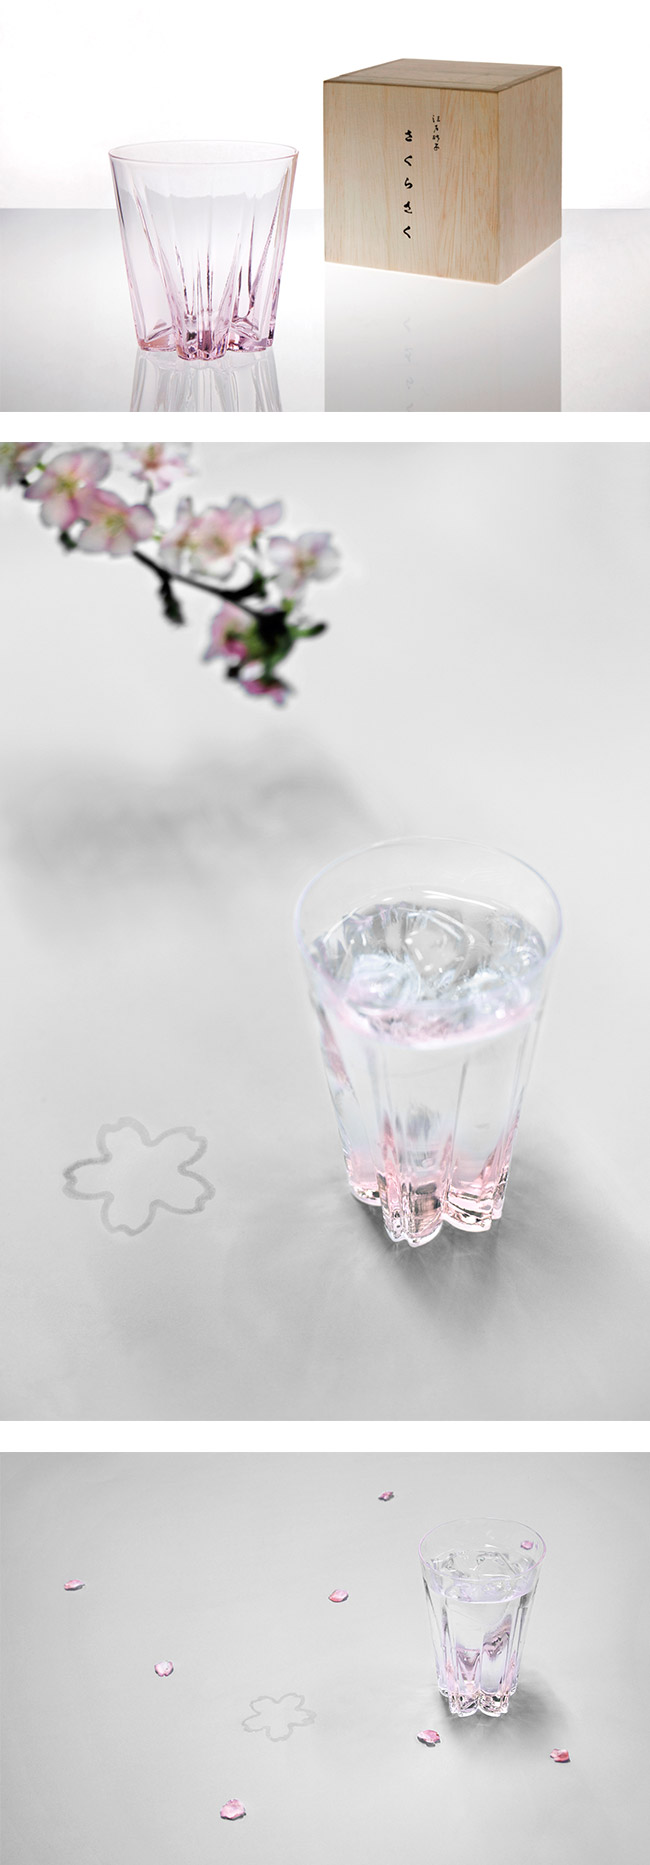 Perrocaliente SAKURASAKU 櫻花杯 威士忌杯 櫻花粉